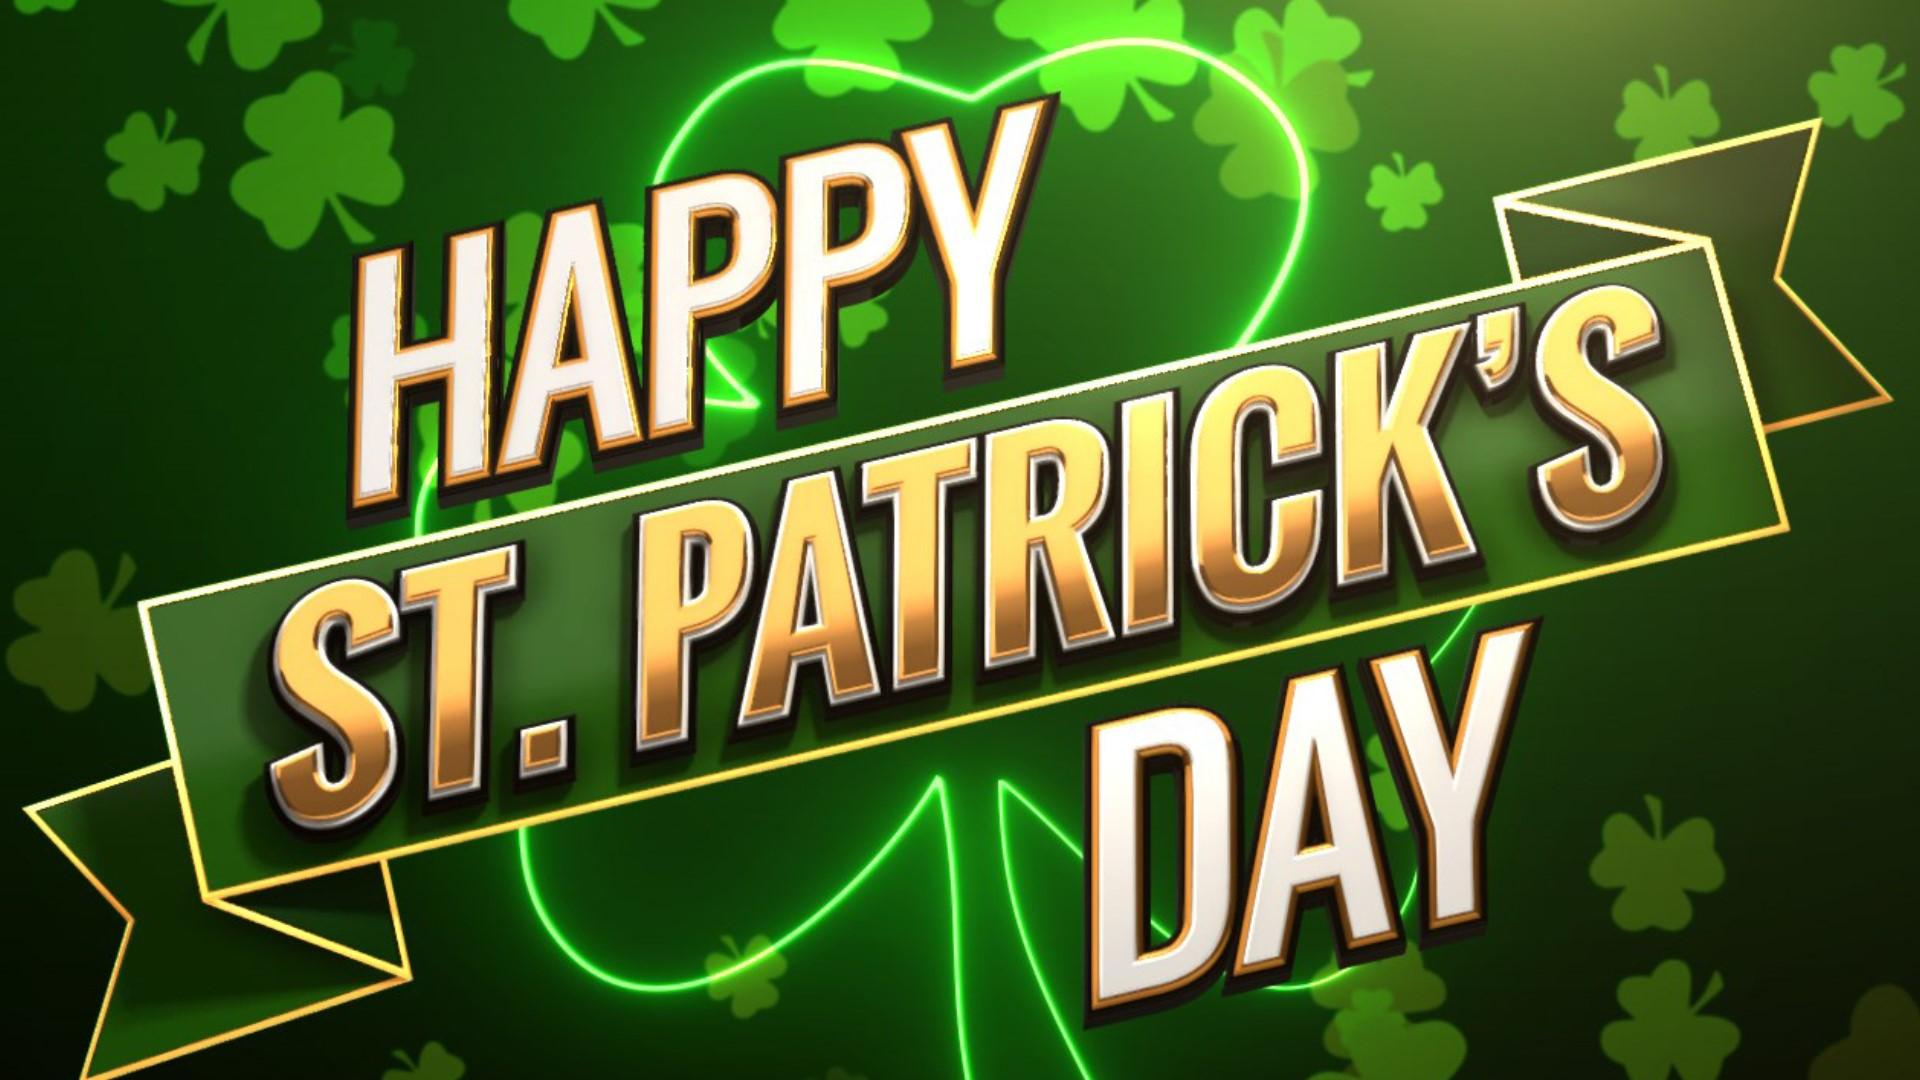 St Patricks Day - Image 2